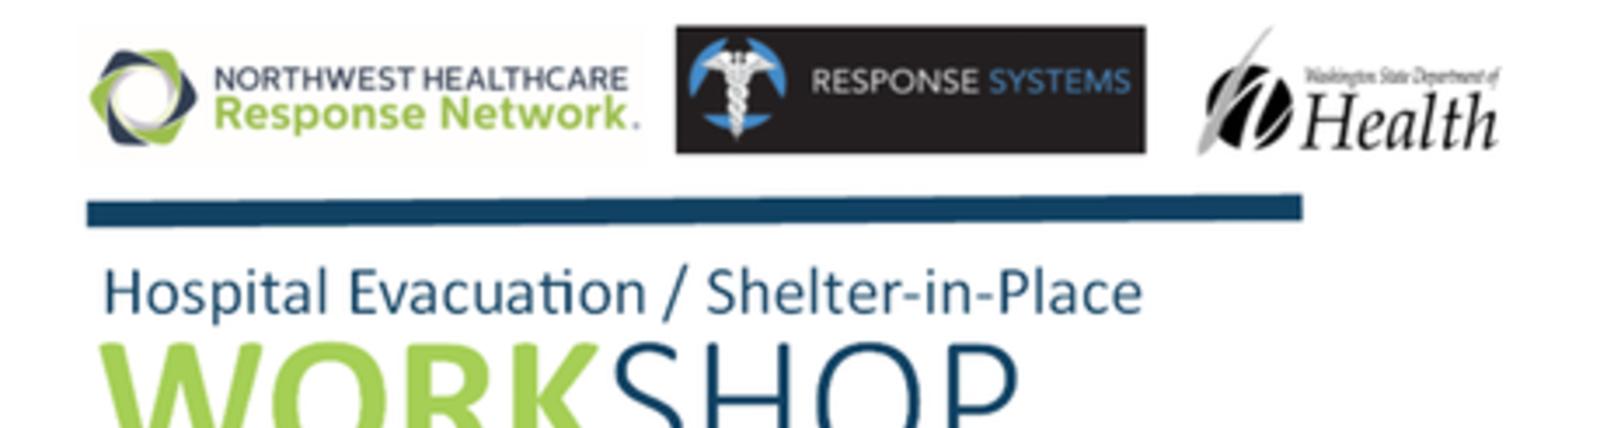 Northwest Healthcare Response Network